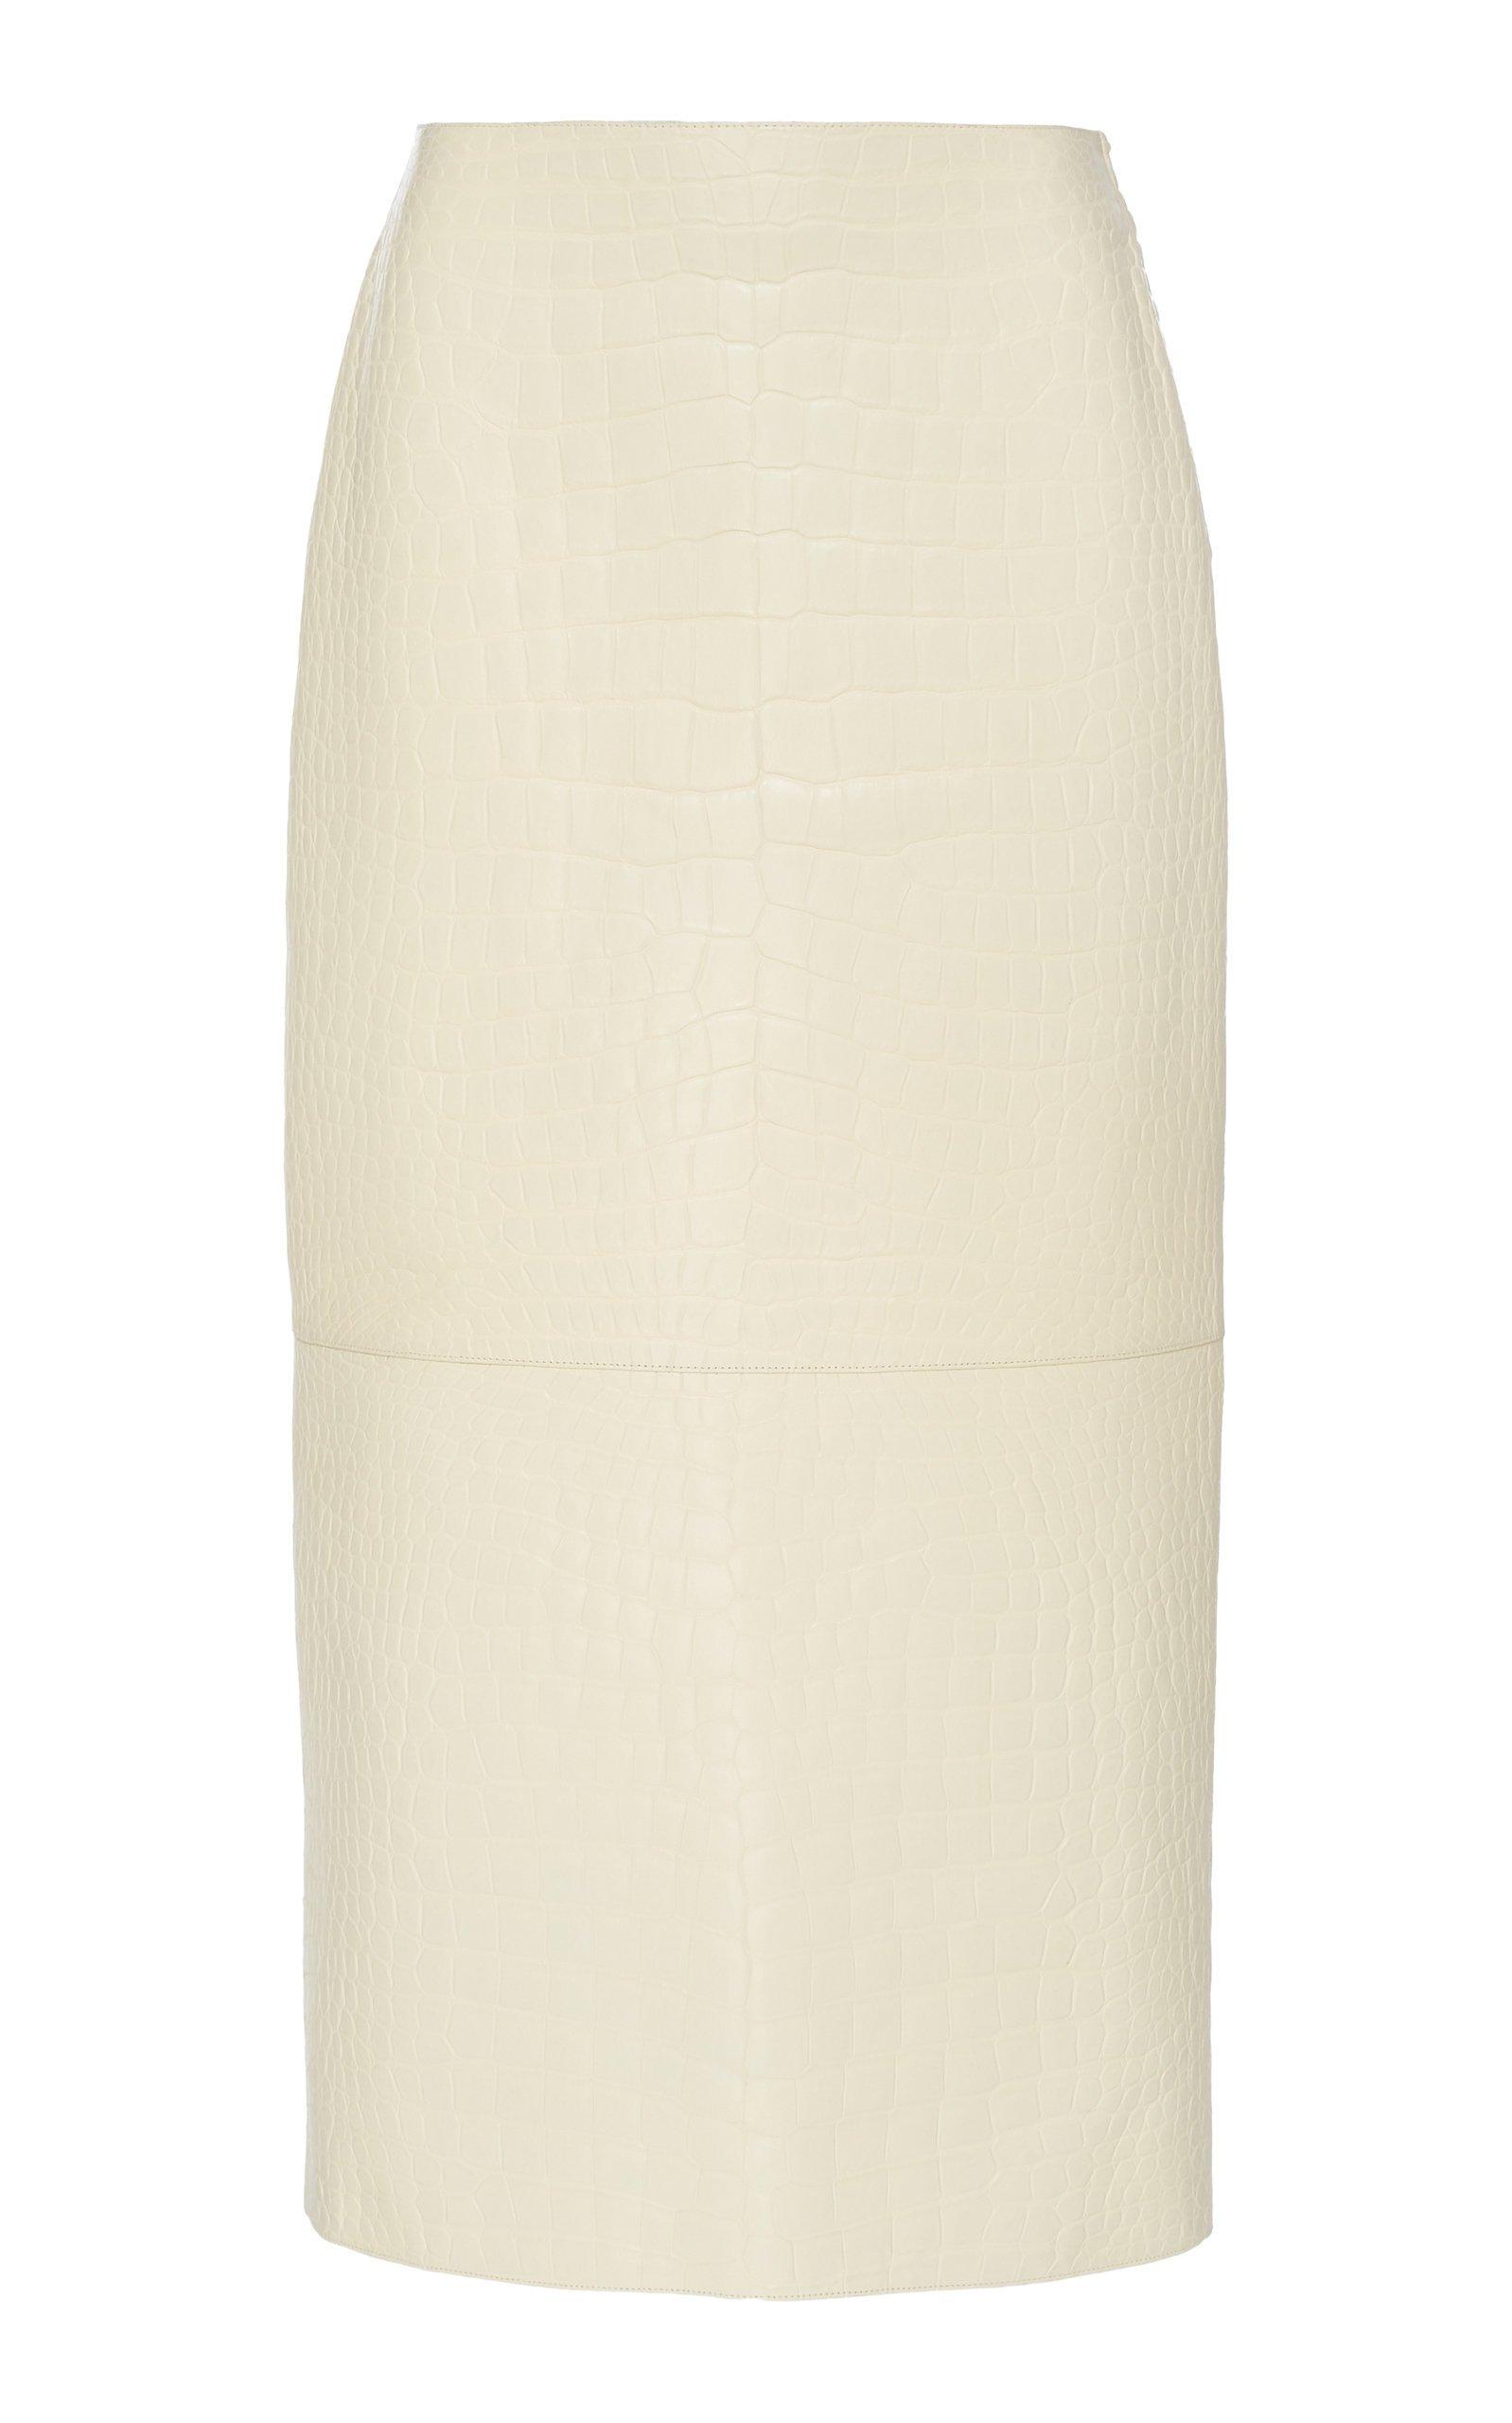 The Row Jenna Crocodile Midi Skirt Size: 14